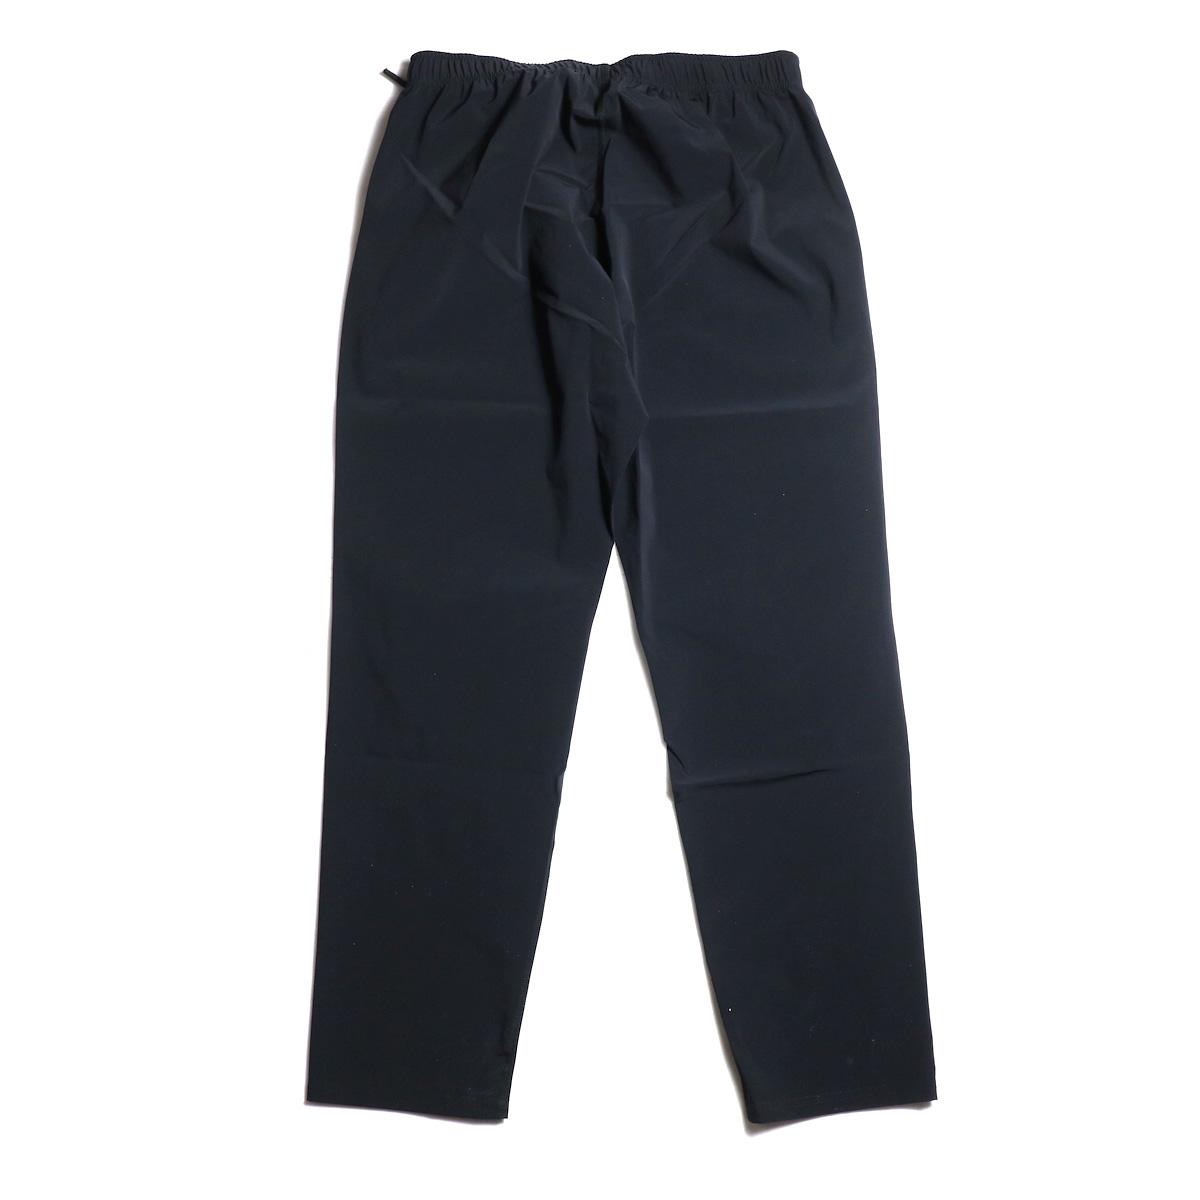 SOUTH2 WEST8 / 1P Cycle Pant-N/Pu Taffeta (Black) 背面